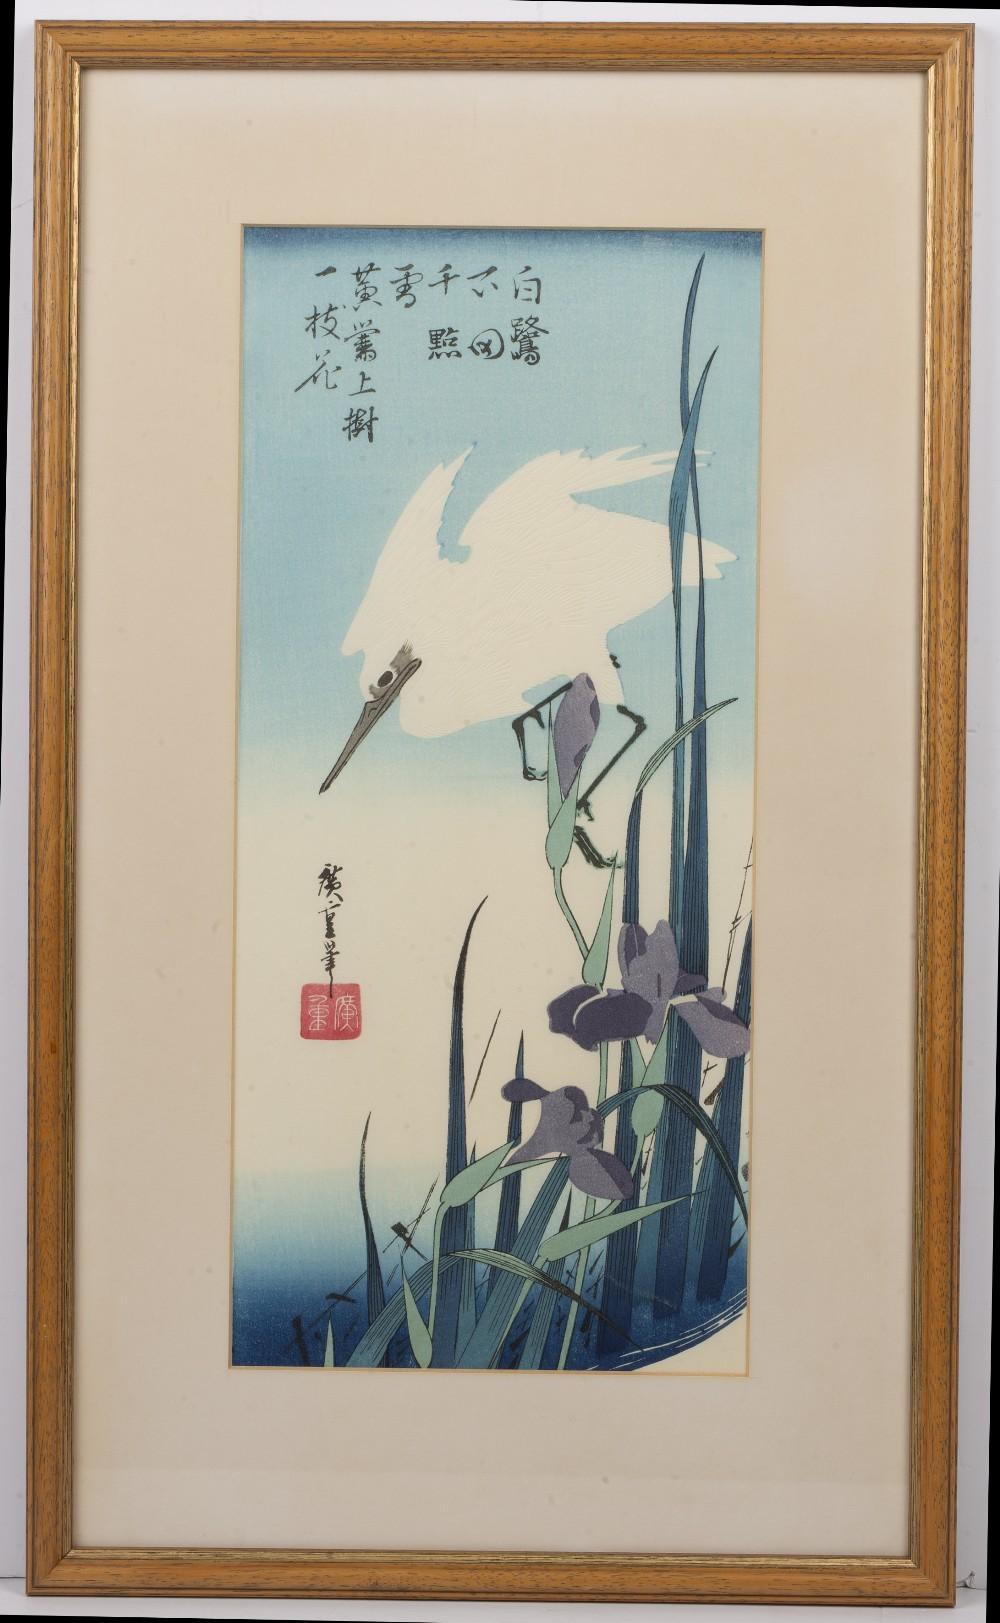 Ando/Utagawa Hiroshige (1797-1858) 'White heron and Iris' Japanese woodblock, 37.5cm x 17cm - Image 2 of 3